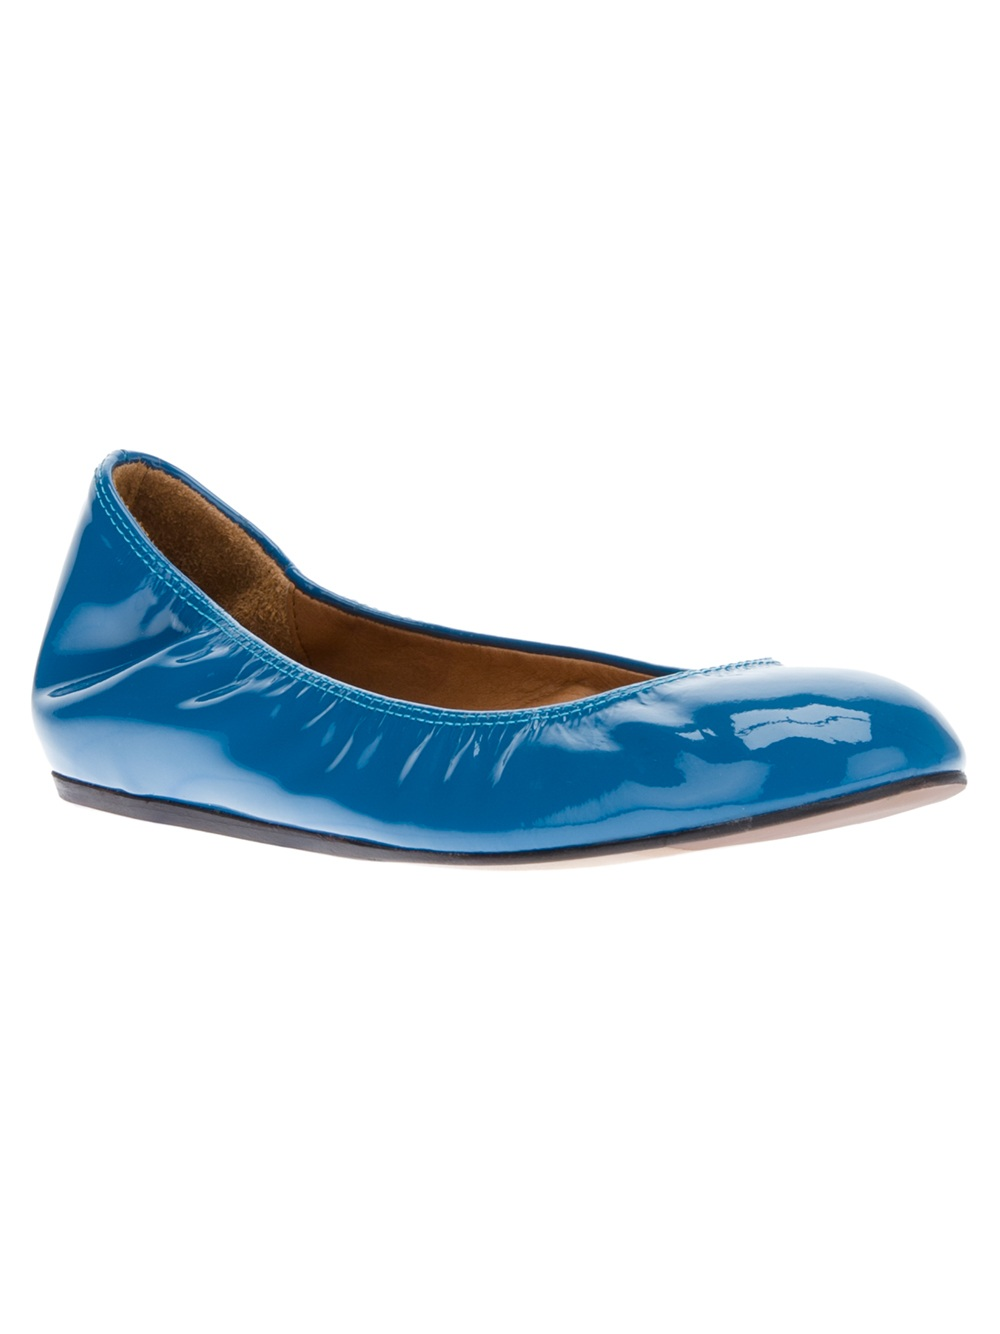 Ferragamo Womens Shoes Blue